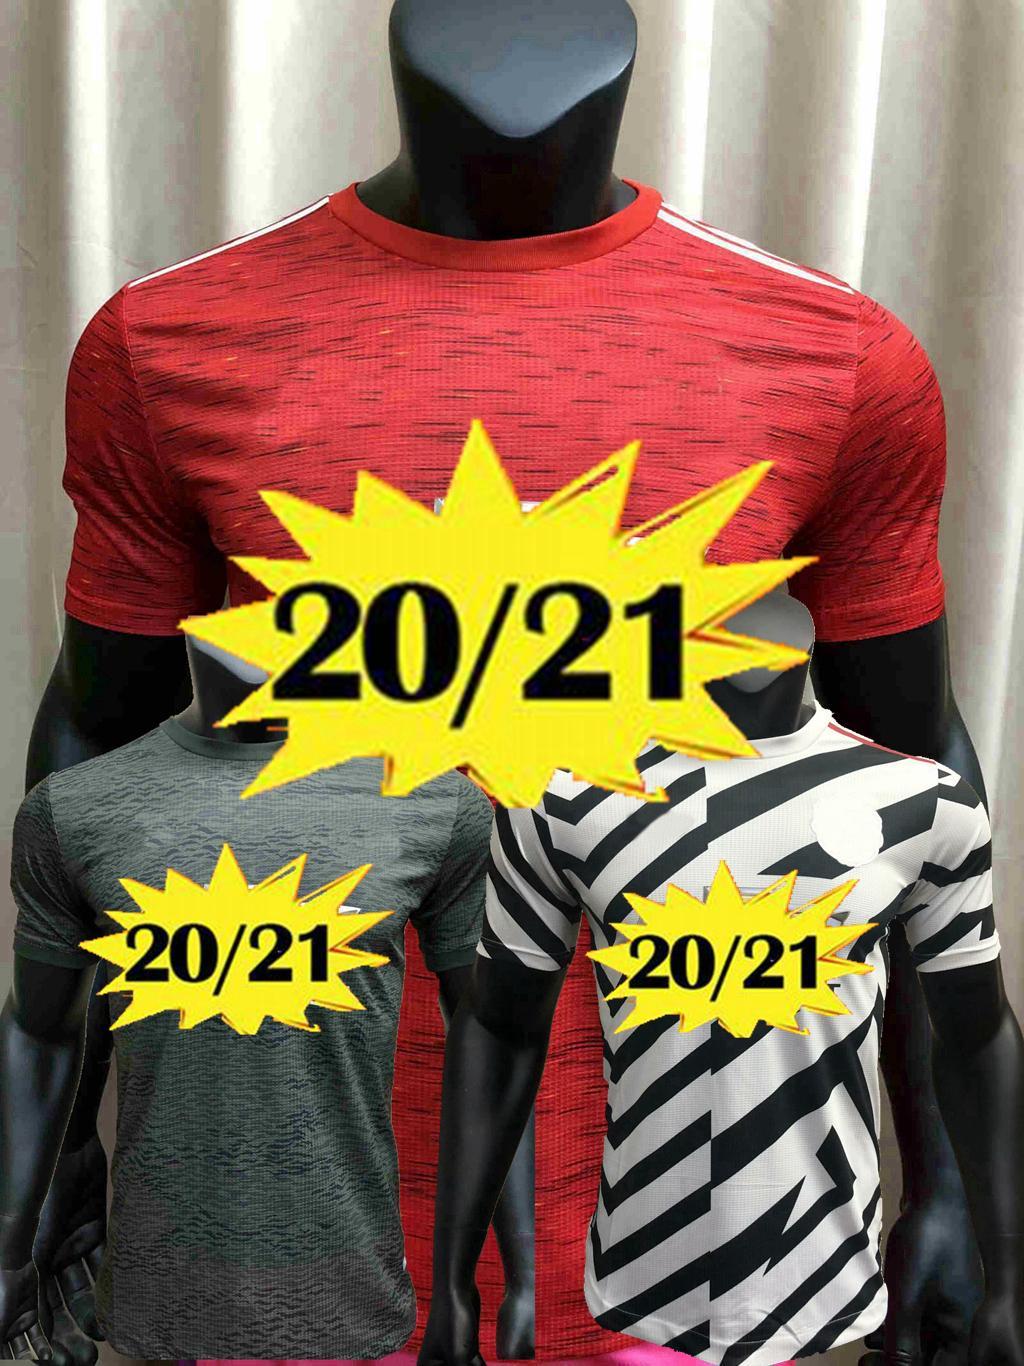 Player version Manchester 20 21 UTD soccer jerseys united soccer jersey MARTIAL RASHFORD football shirts VAN DE BEEK 2020 2021 Player